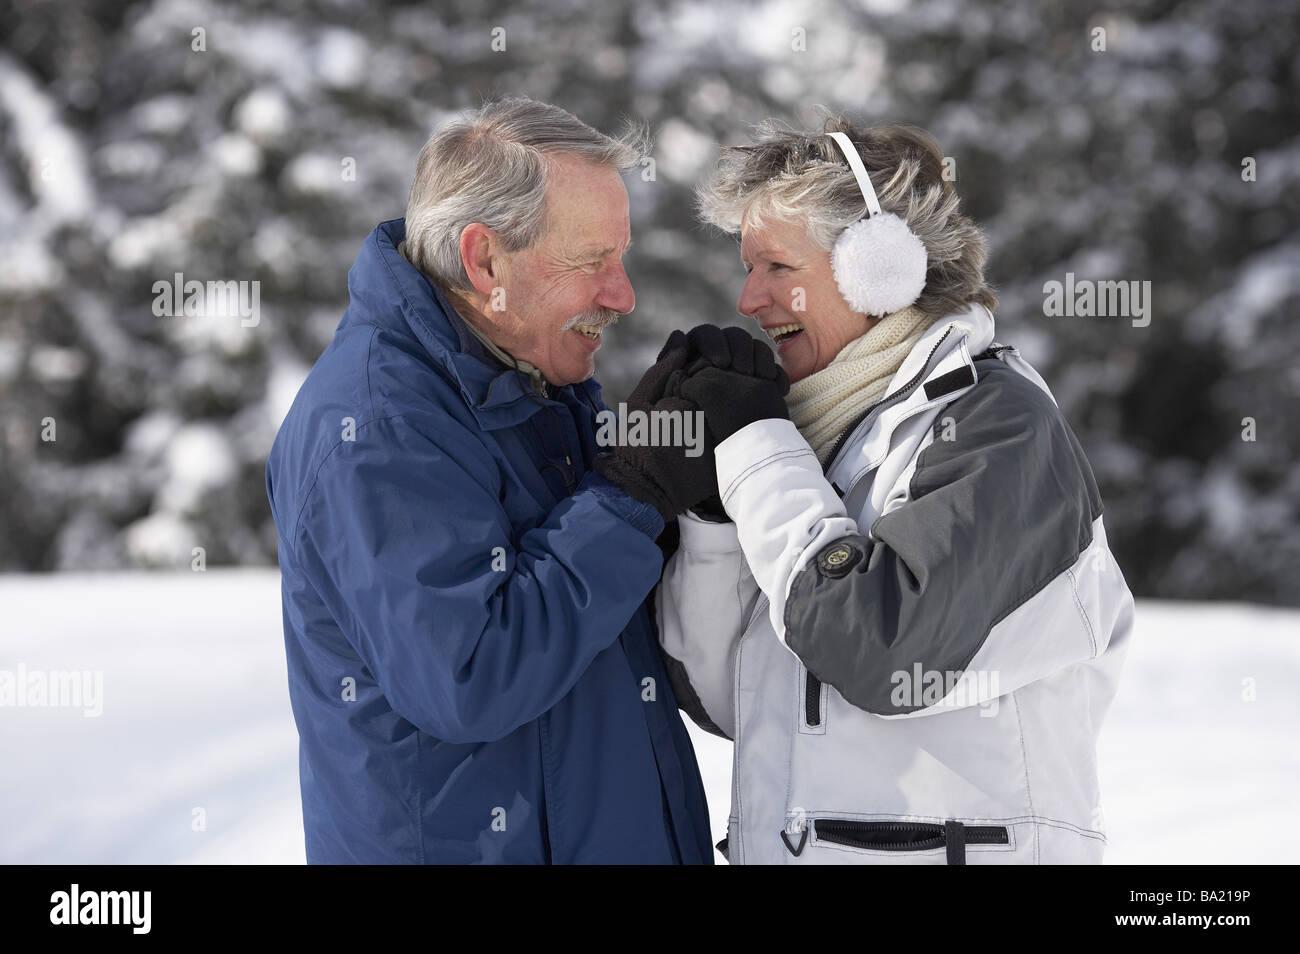 Senior-pairs winter-clothing gaze-contact laugh semi-portrait winters series people 60-70 years pair seniors winter - Stock Image